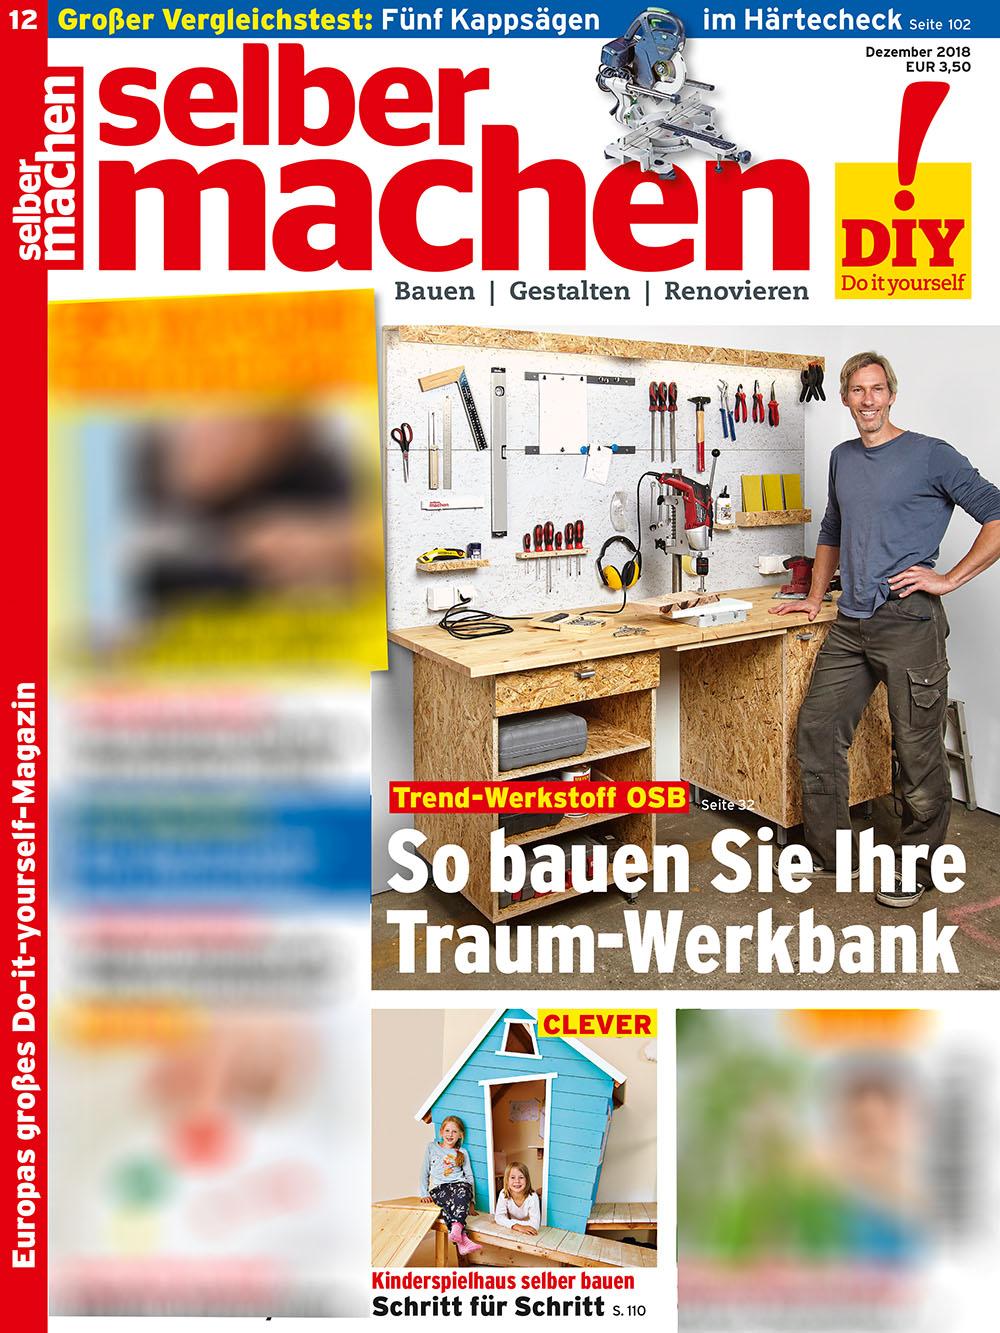 Titel Selbermachen Heft 12/2018